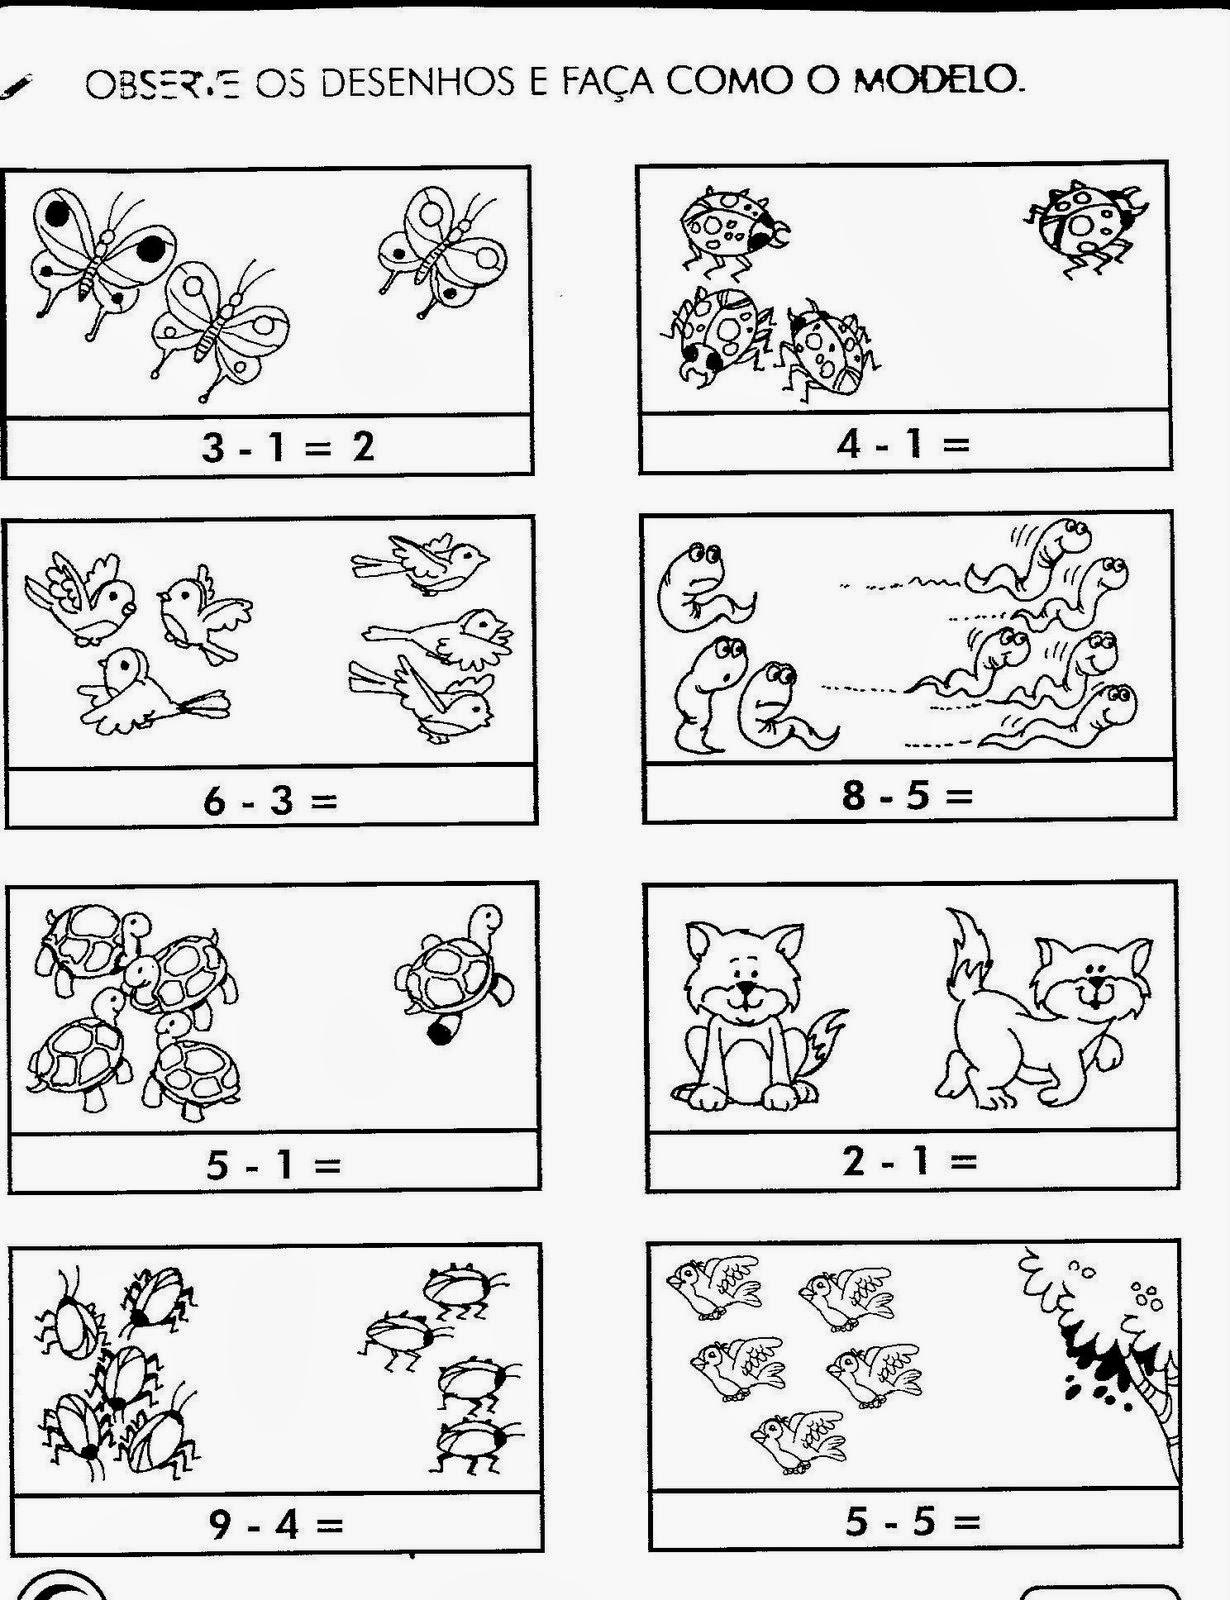 Atividades de matemática para 1o ano ensino fundamental